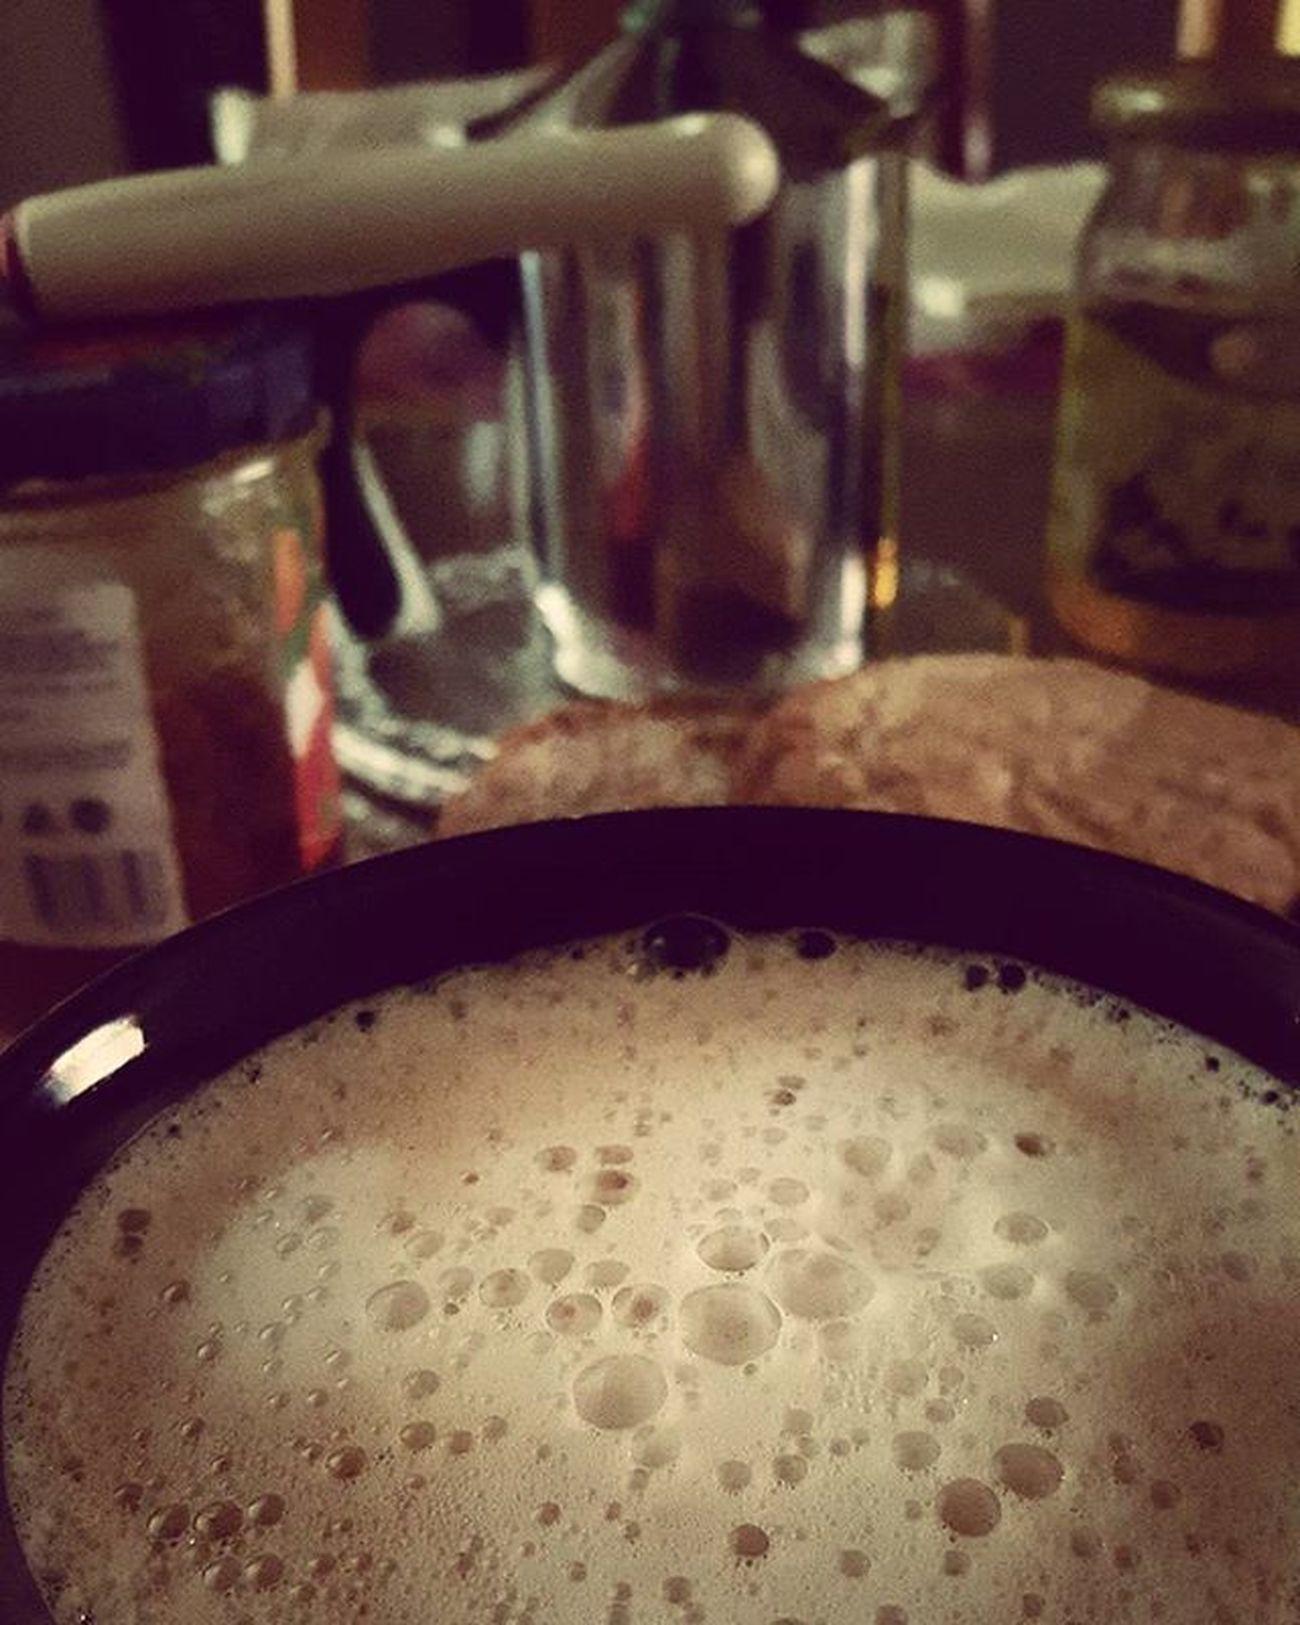 Good morning! Colazione Colazioneitaliana Italianbreakfast Coffeetime Cappuccino Breakfast Italy Italiantastes Goodmorning Haveaniceday Buonagiornata